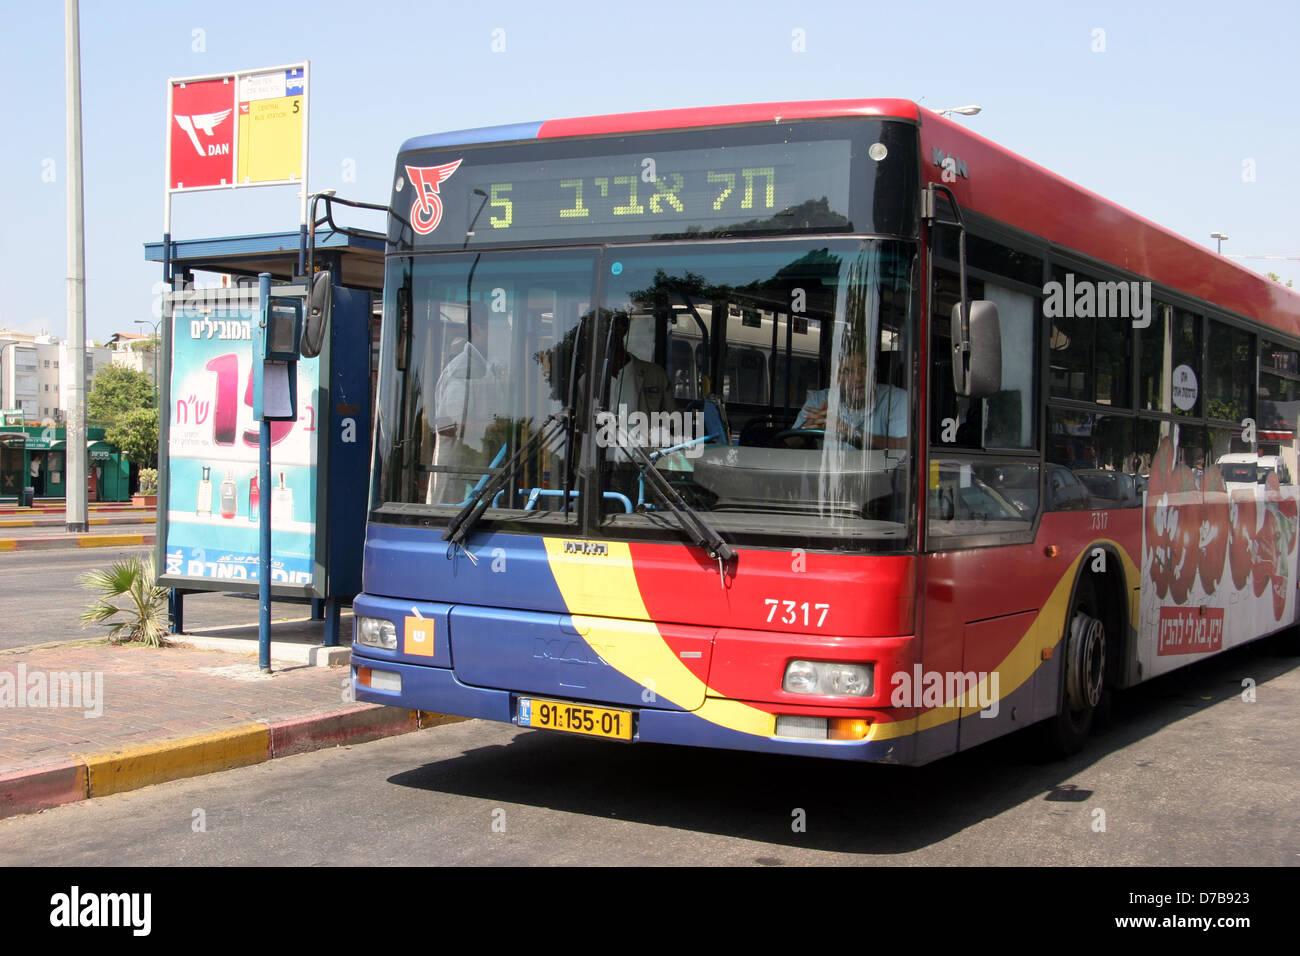 dan bus in tel aviv - Stock Image